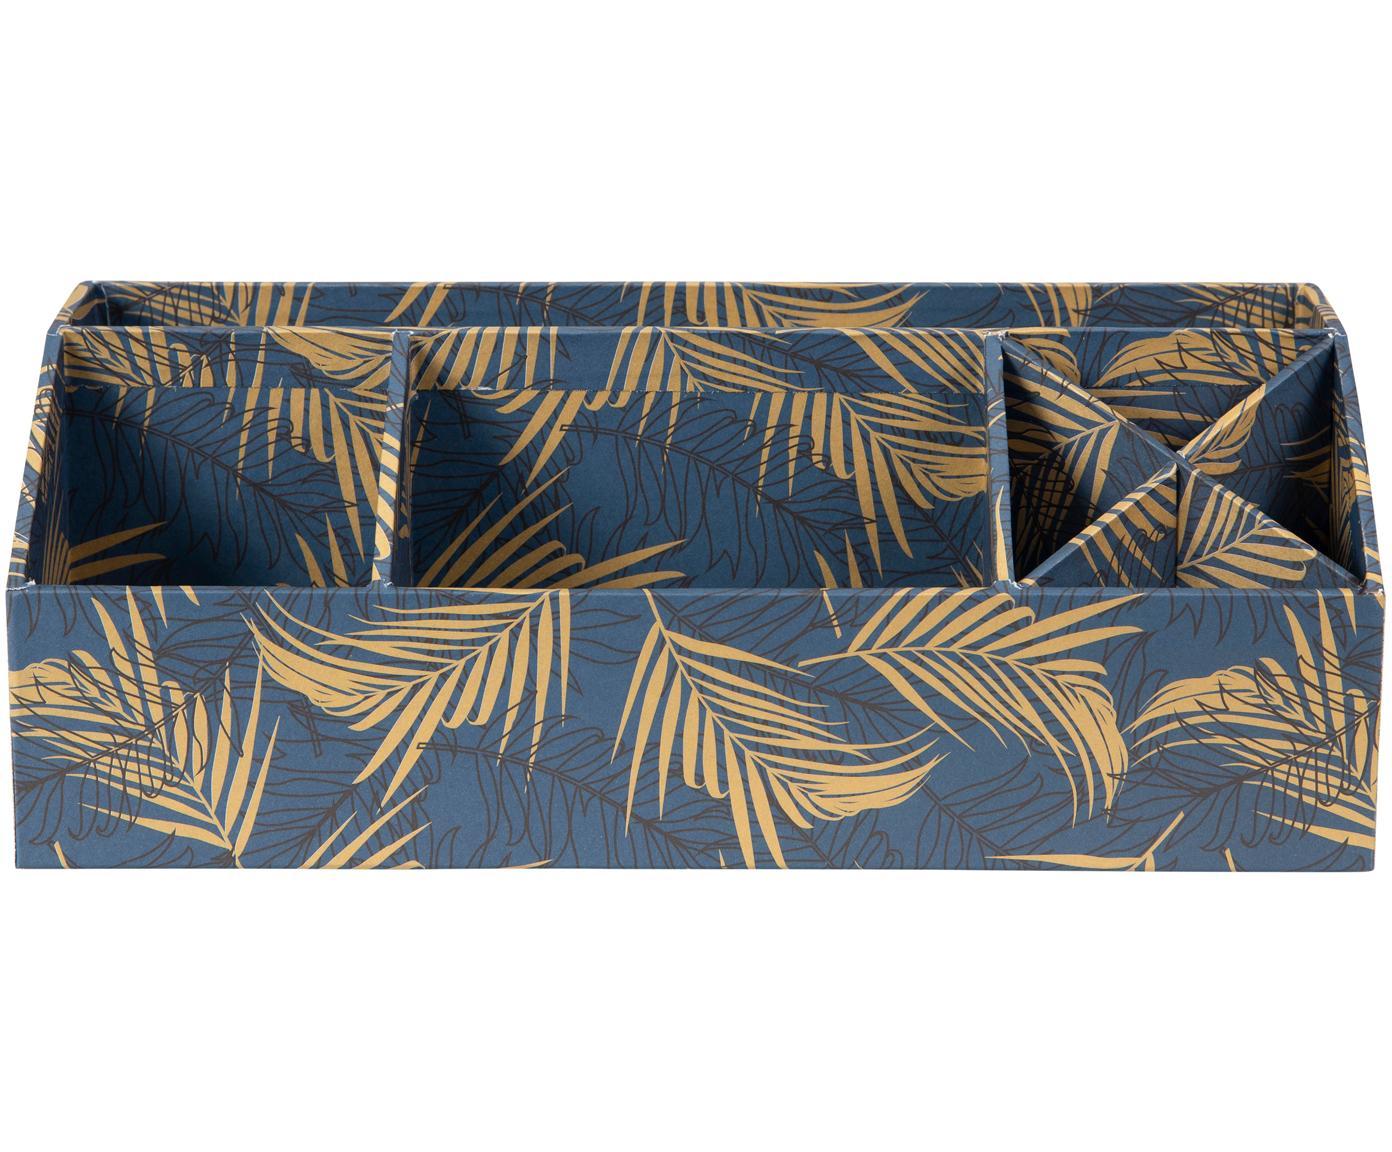 Bureau organizer Elisa, Massief, gelamineerd karton, Goudkleurig, grijsblauw, 33 x 13 cm